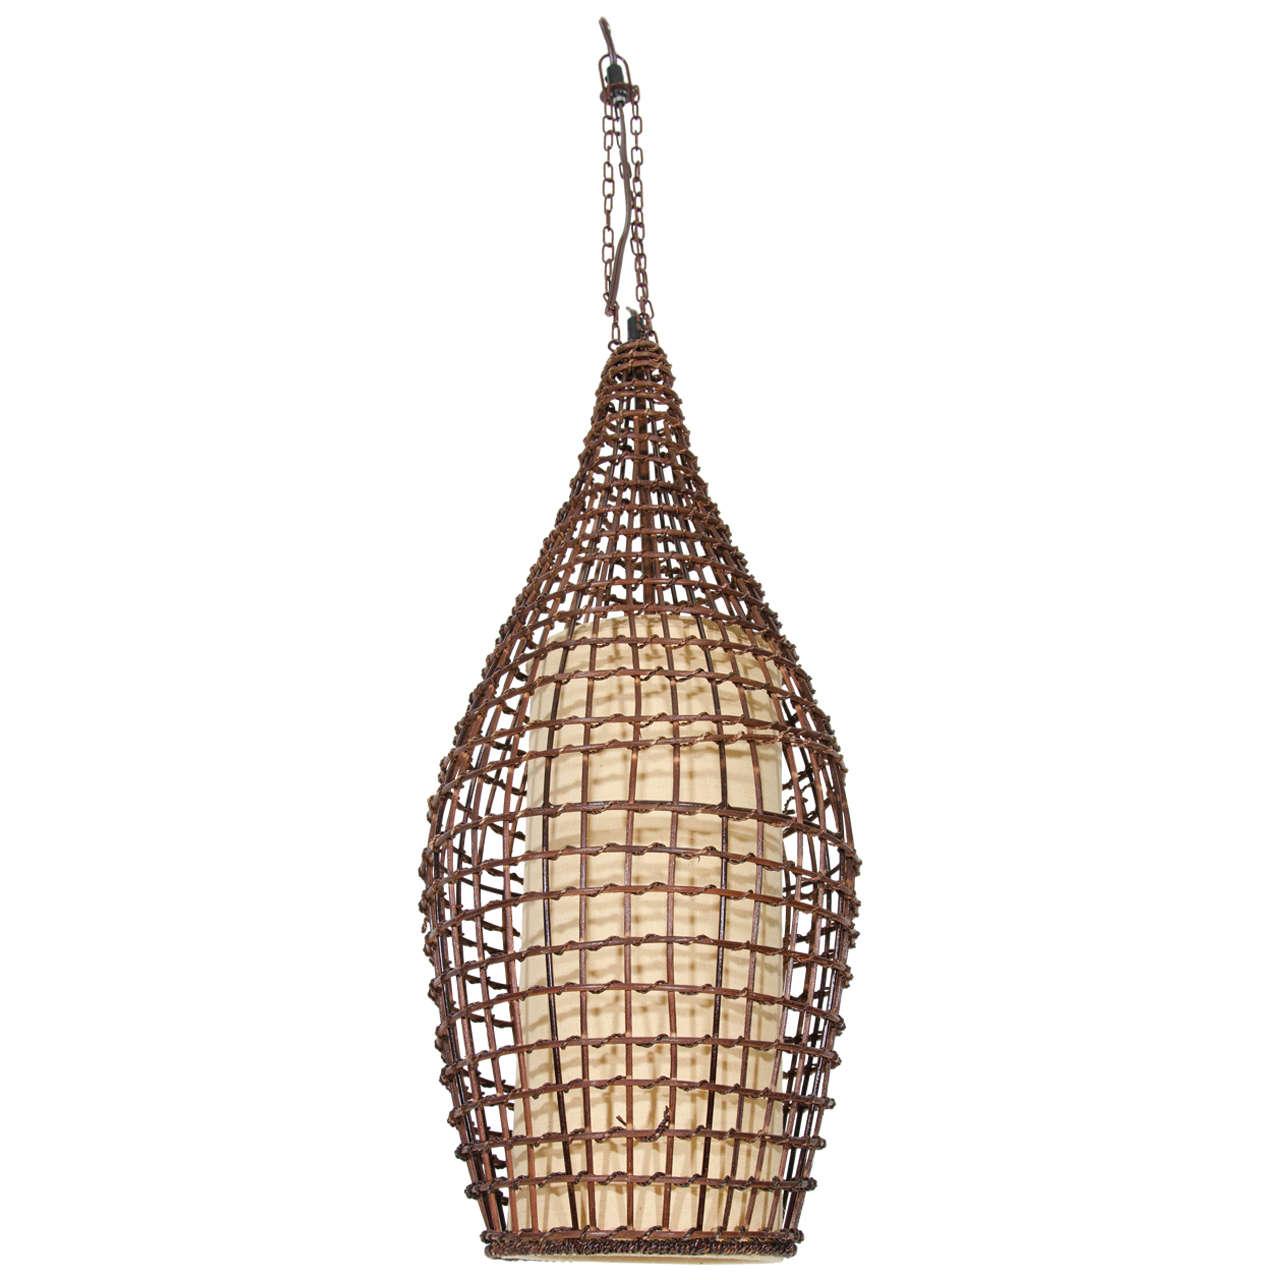 Midcentury Basket Style Wicker Pendant Or Lantern At 1stdibs